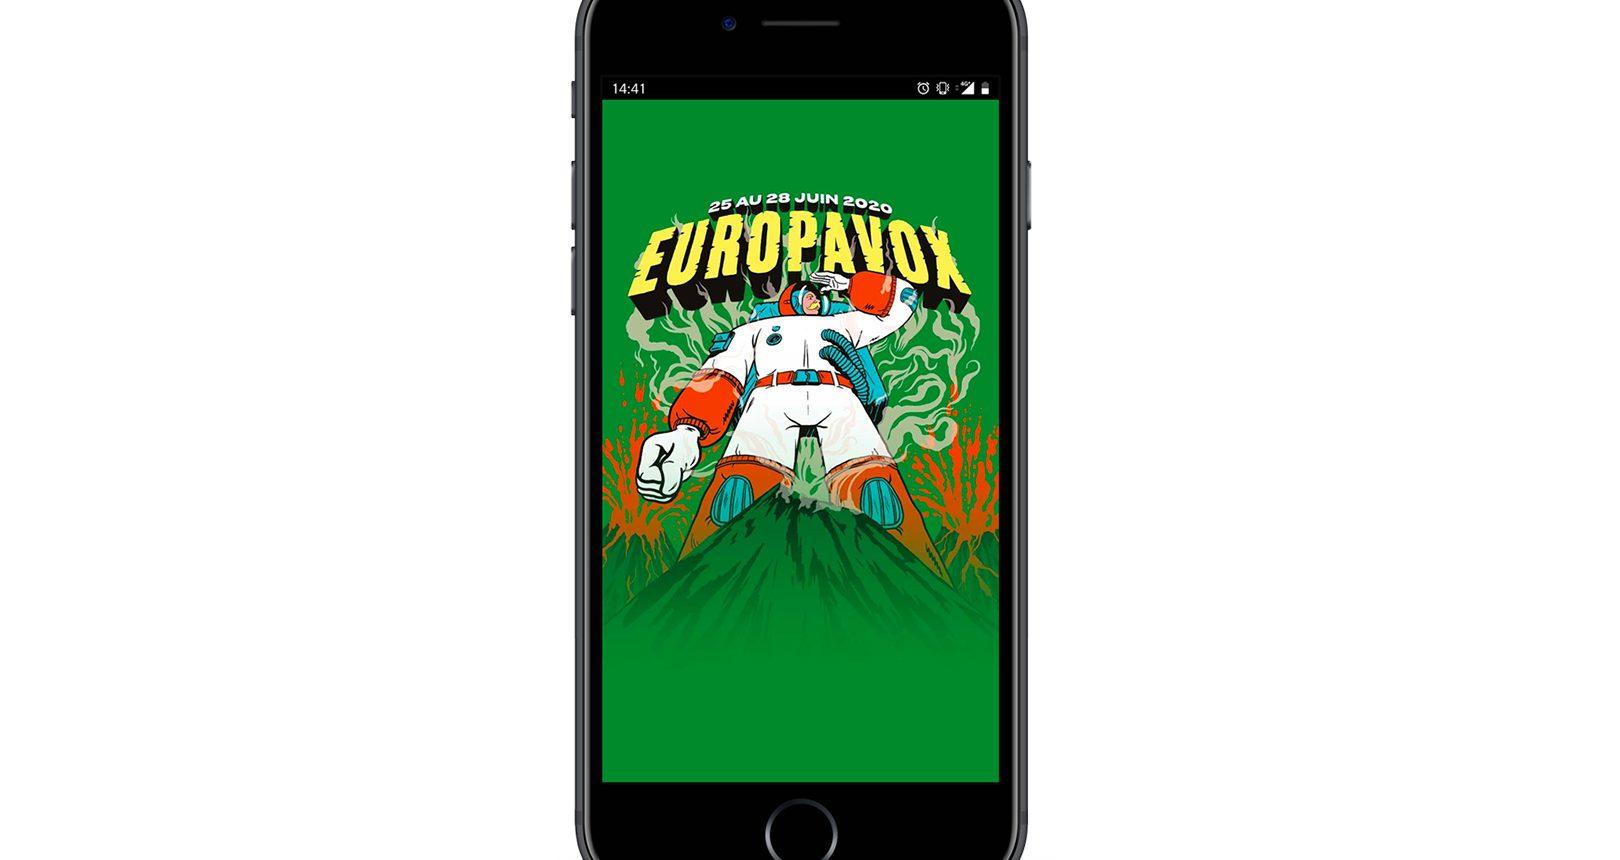 Application Europavox